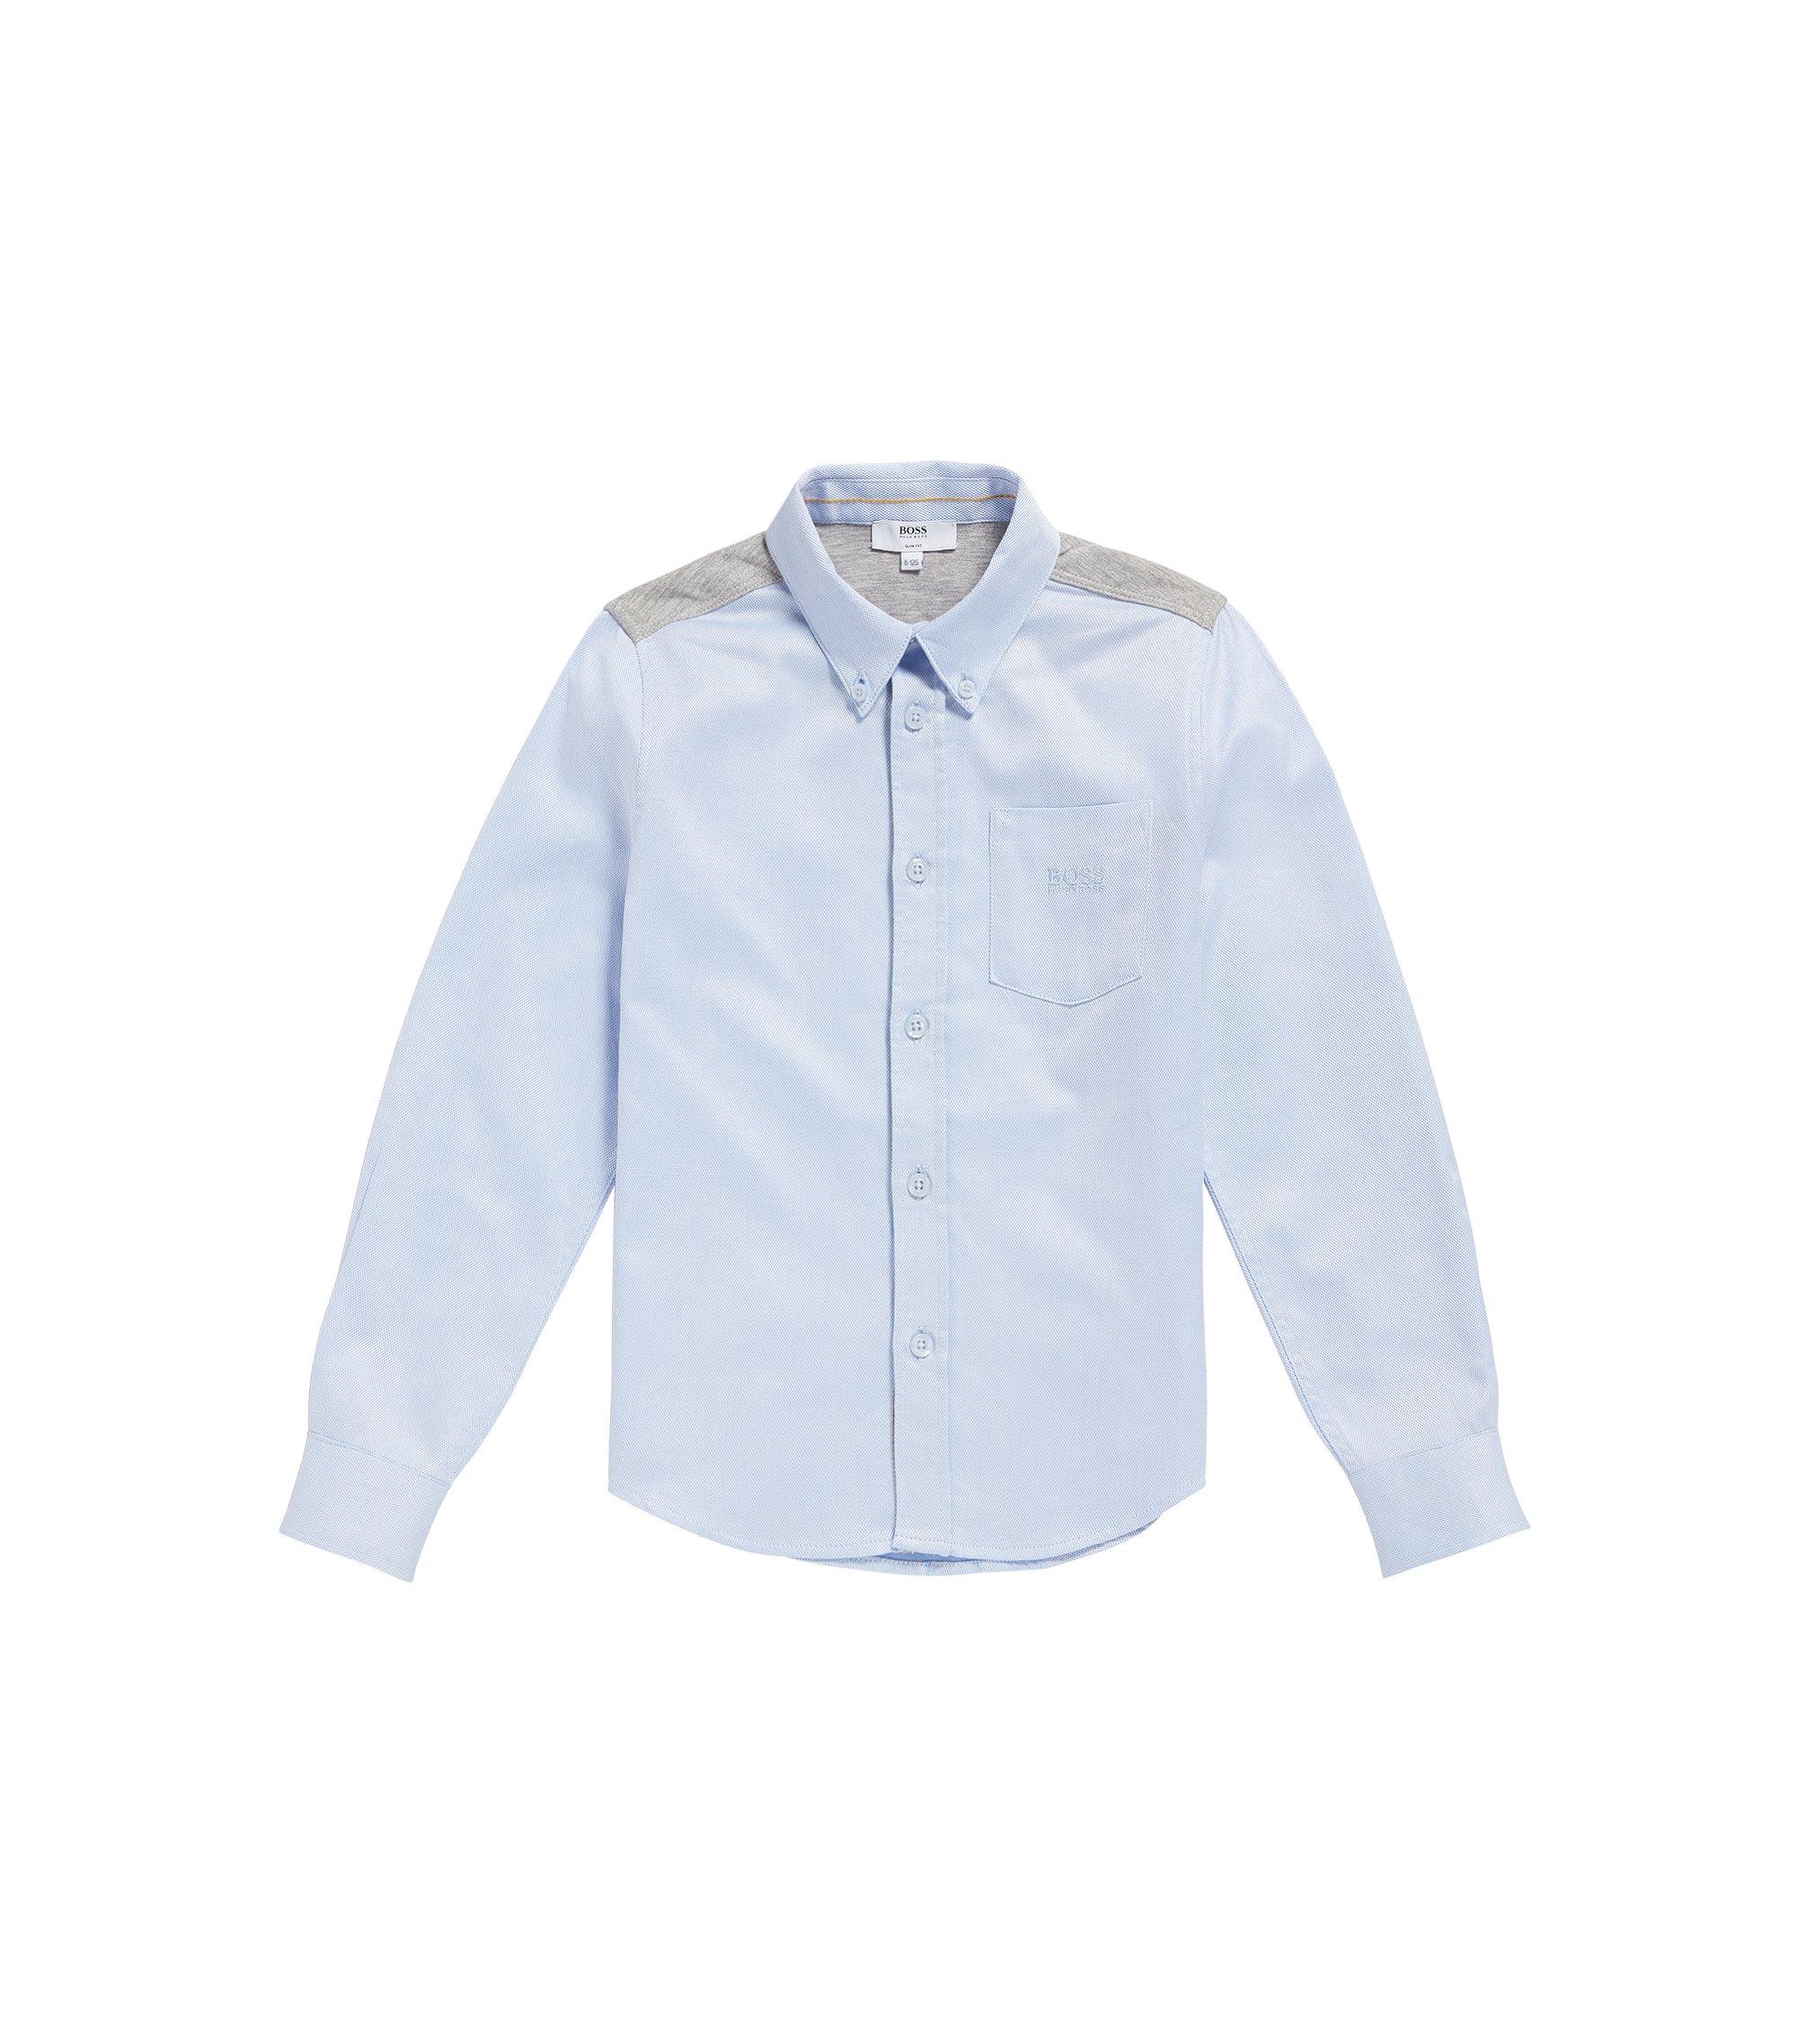 Camisa en algodón con ribetes de punto para niño: 'J25990', Celeste